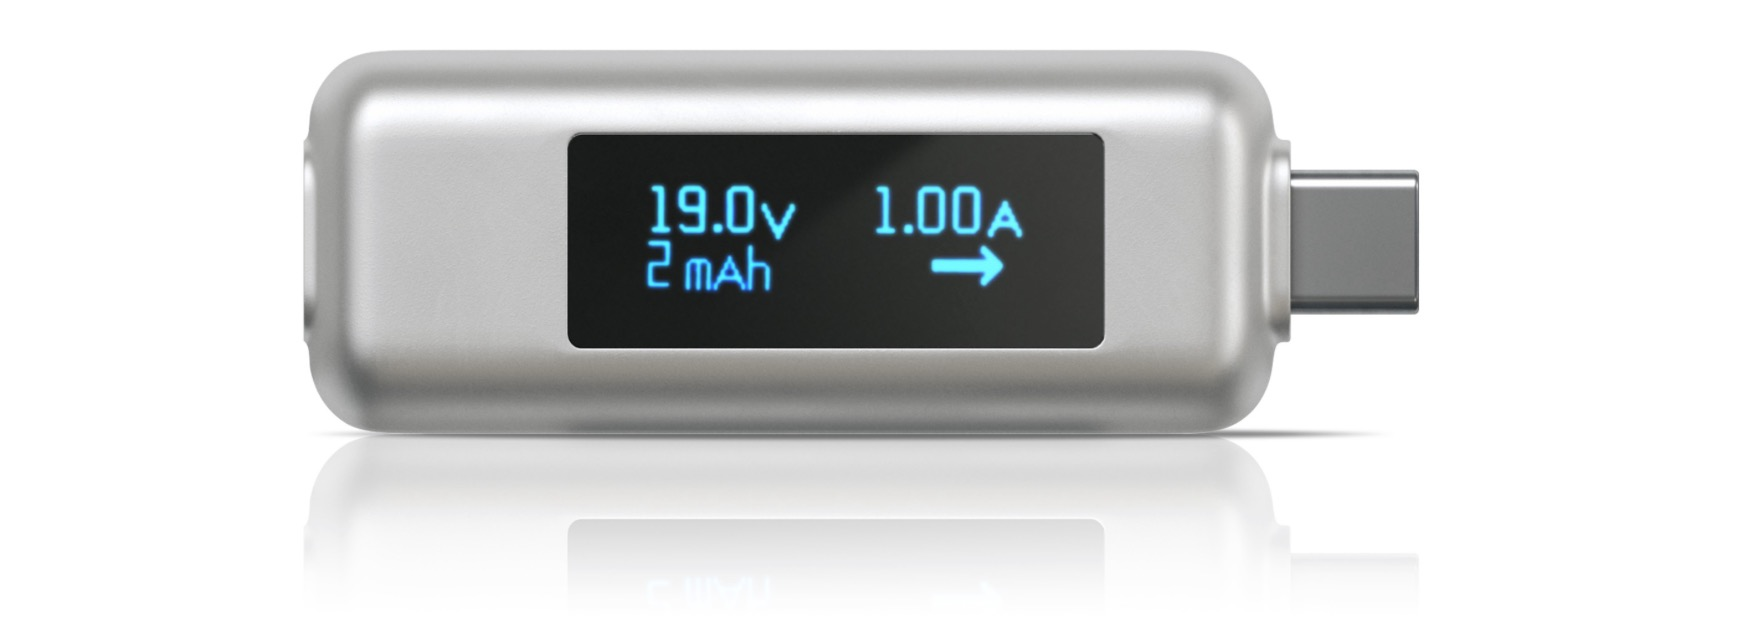 Satechi Type-C Power Meter